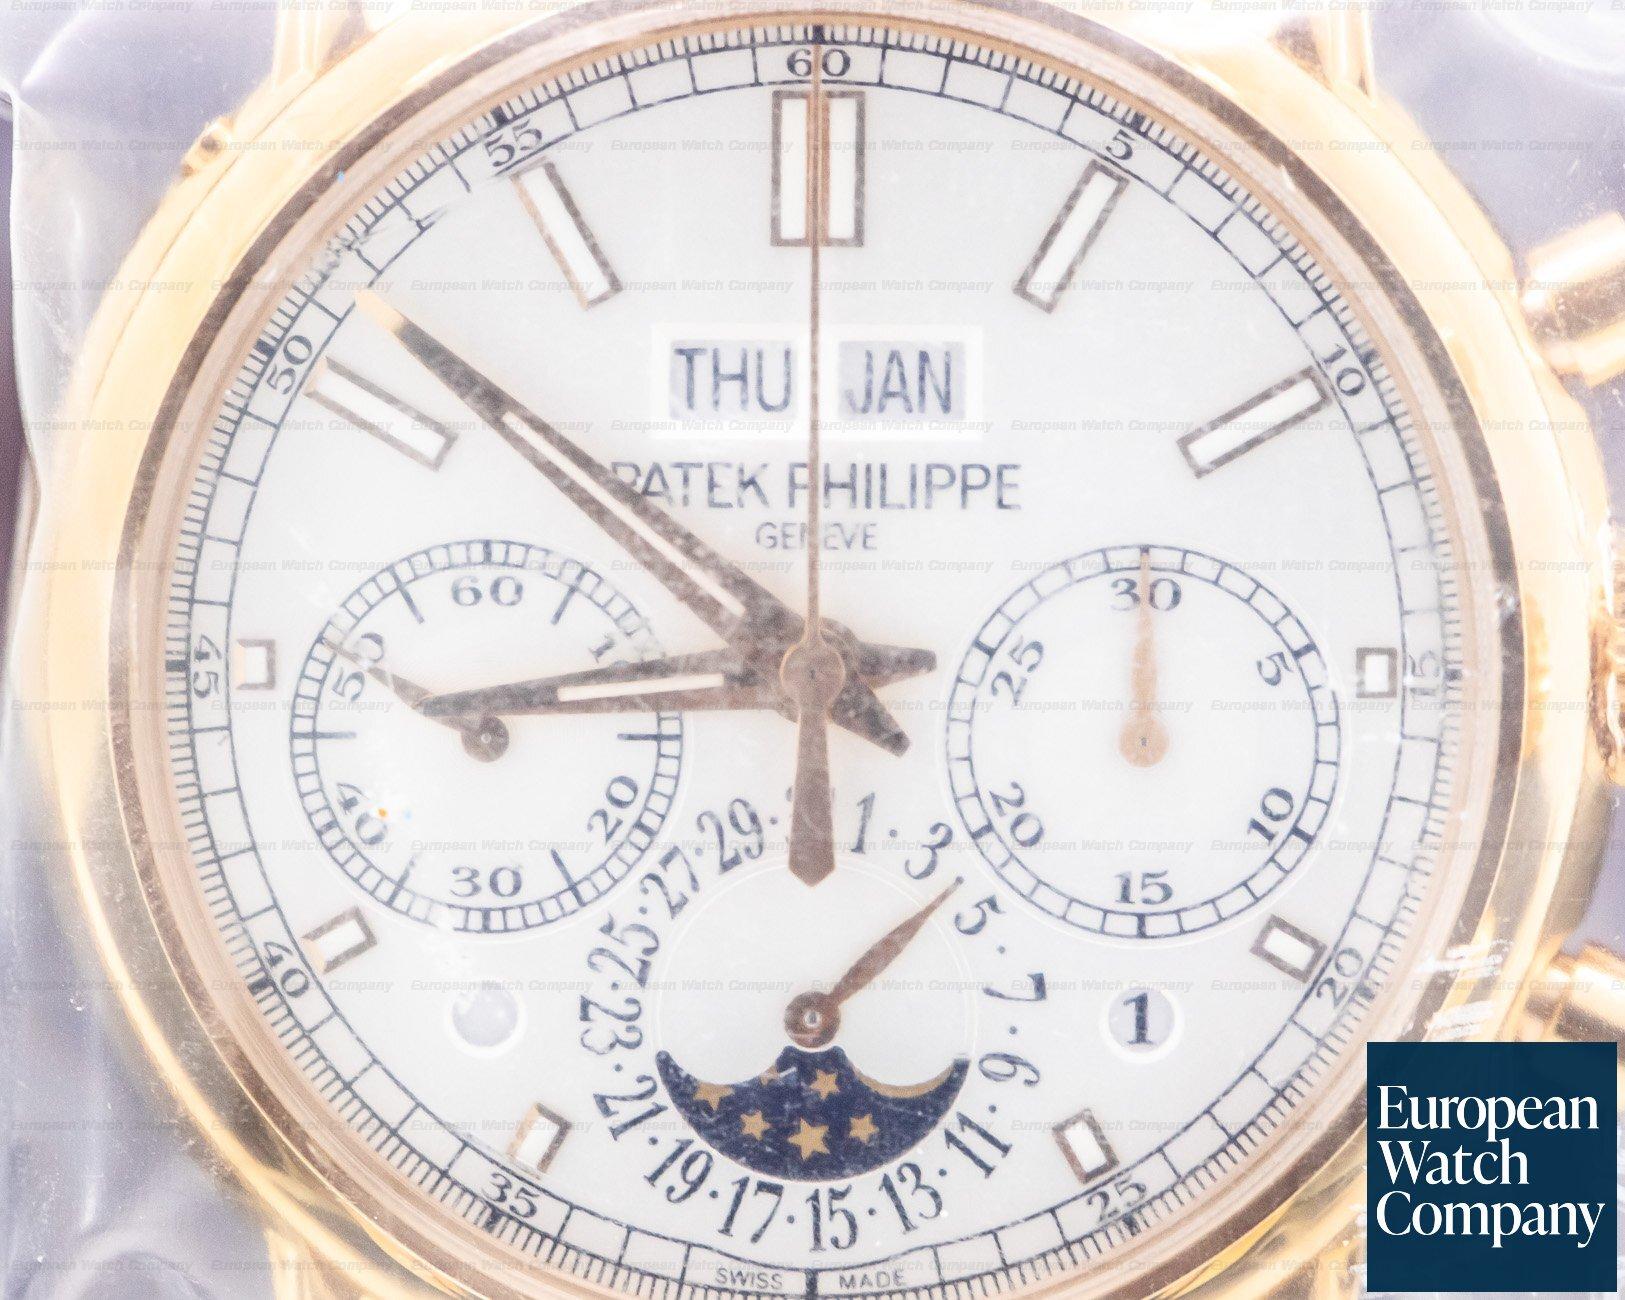 Patek Philippe 5204R-001 Split Second Perpetual Calendar Chronograph Rose Gold UNWORN